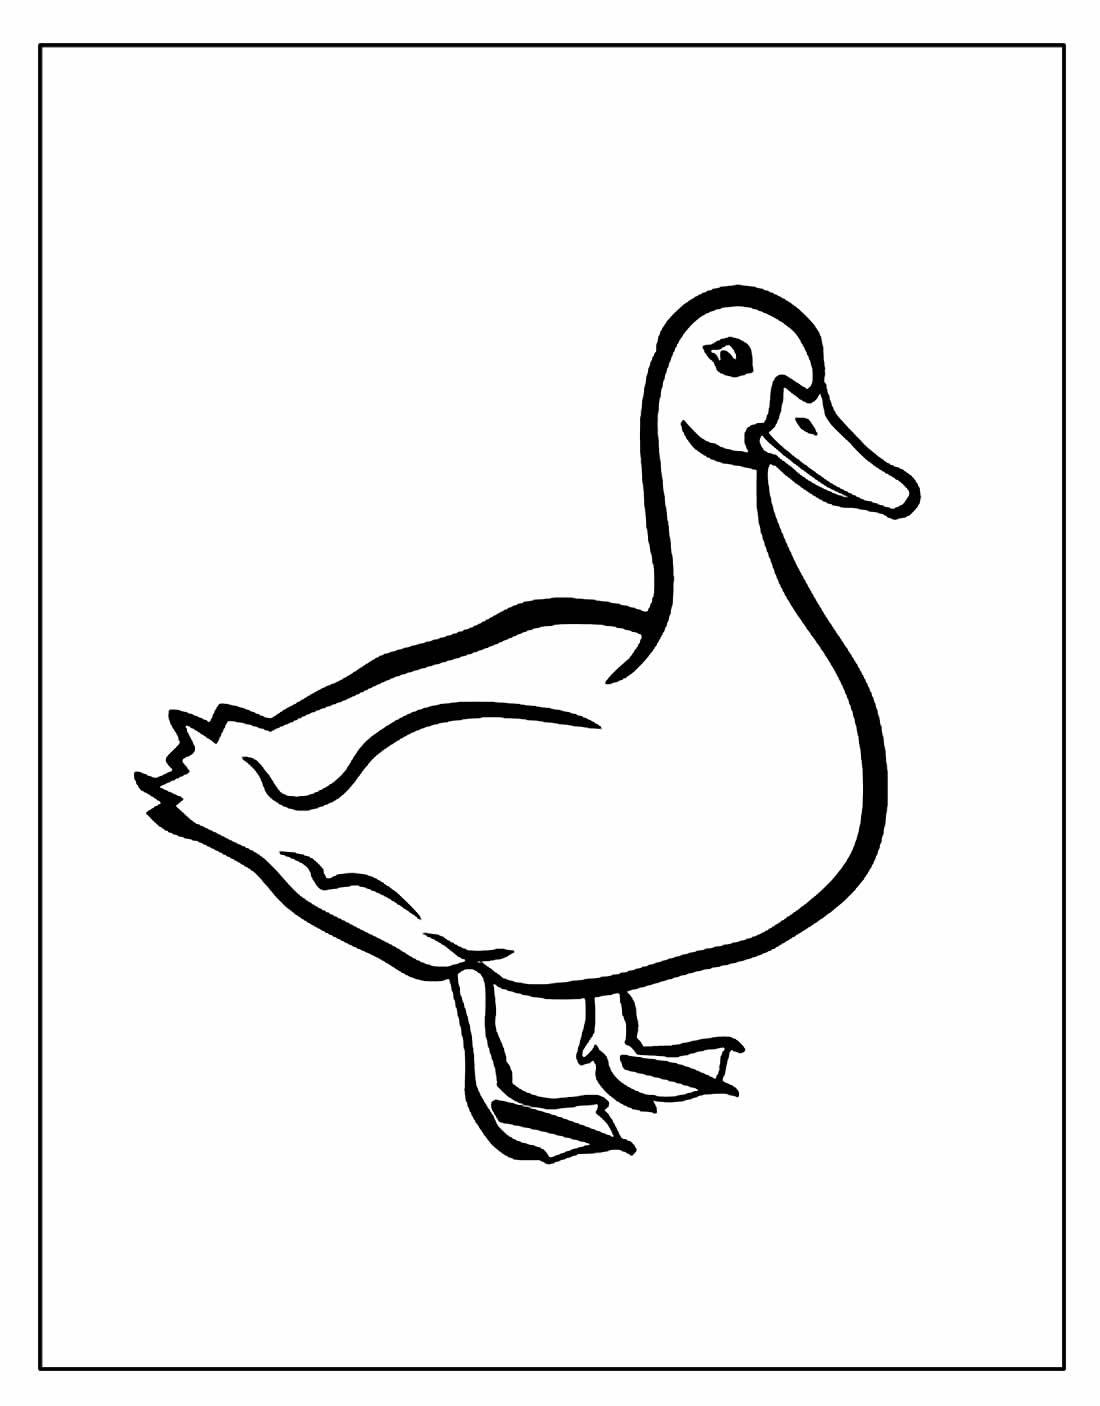 Desenho para colorir de Pato